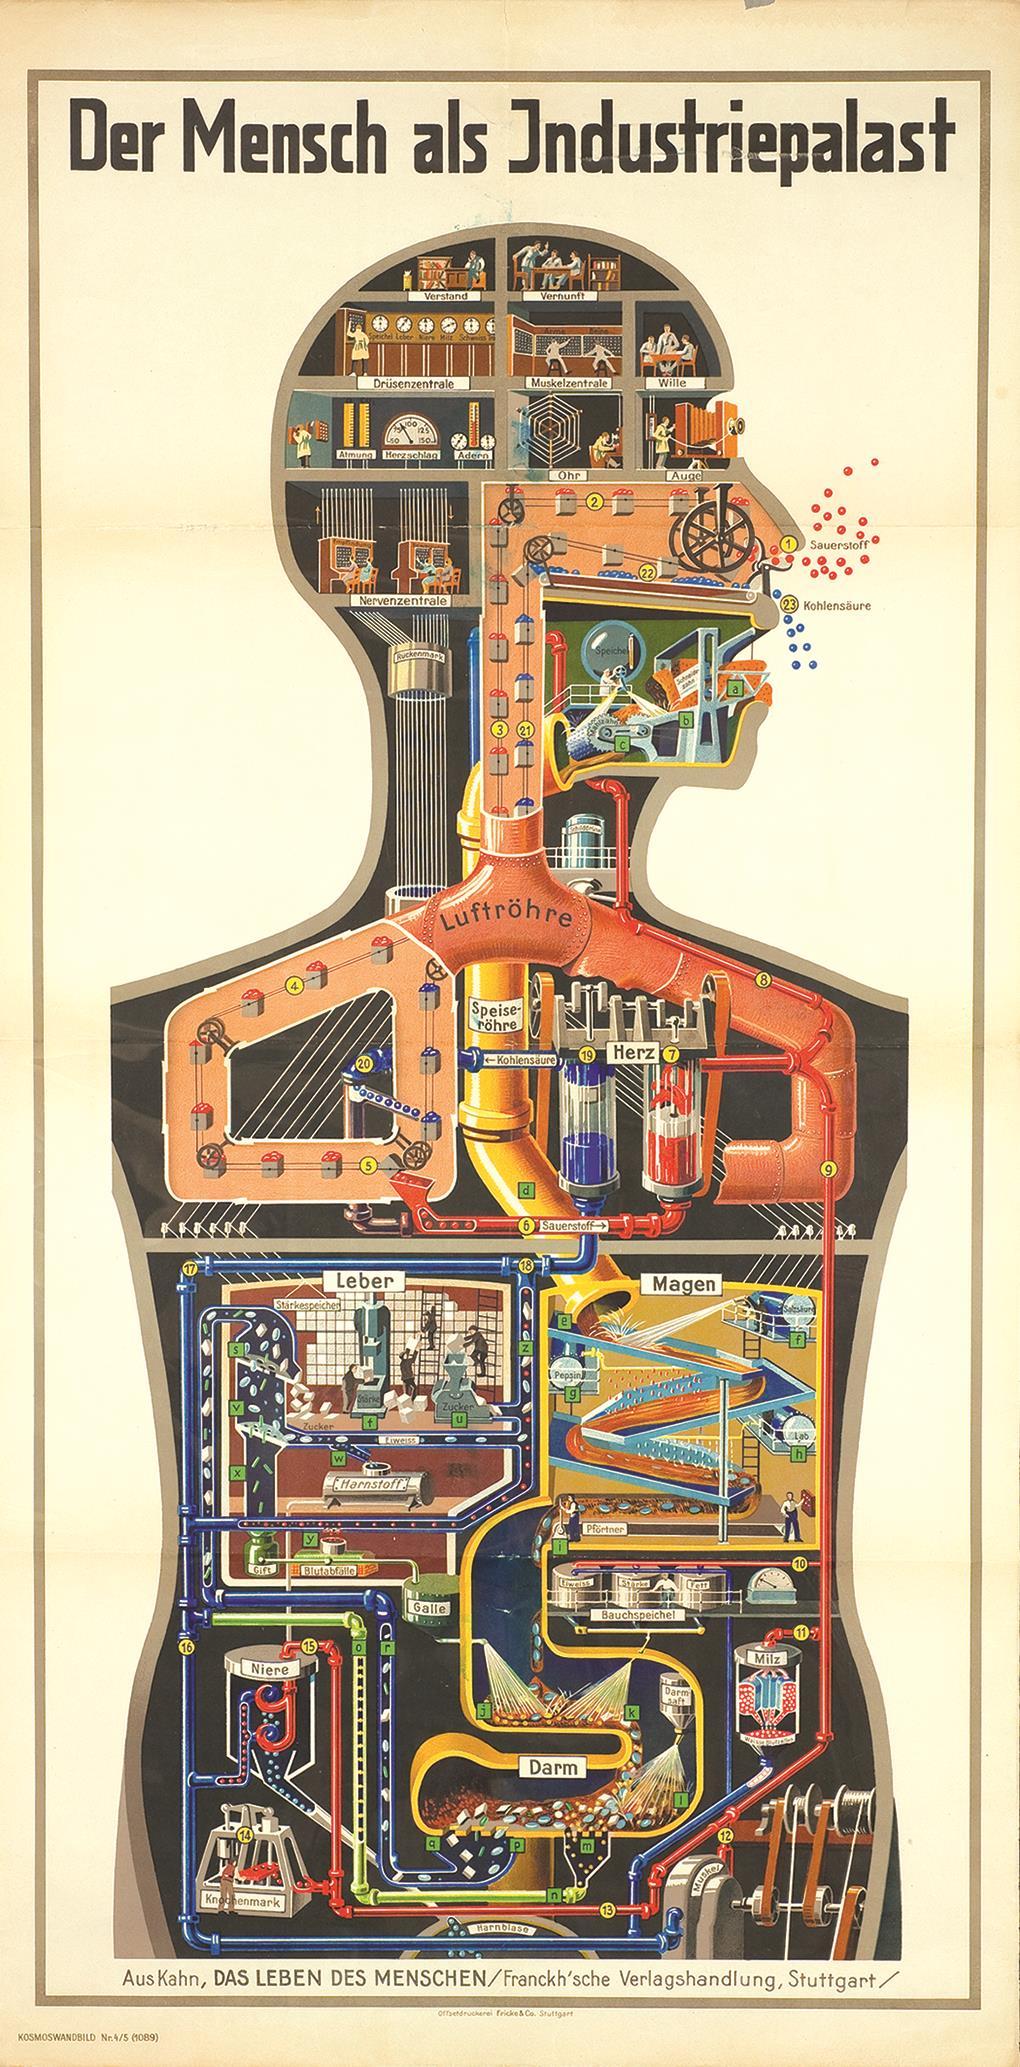 Man as an Industrial Palace